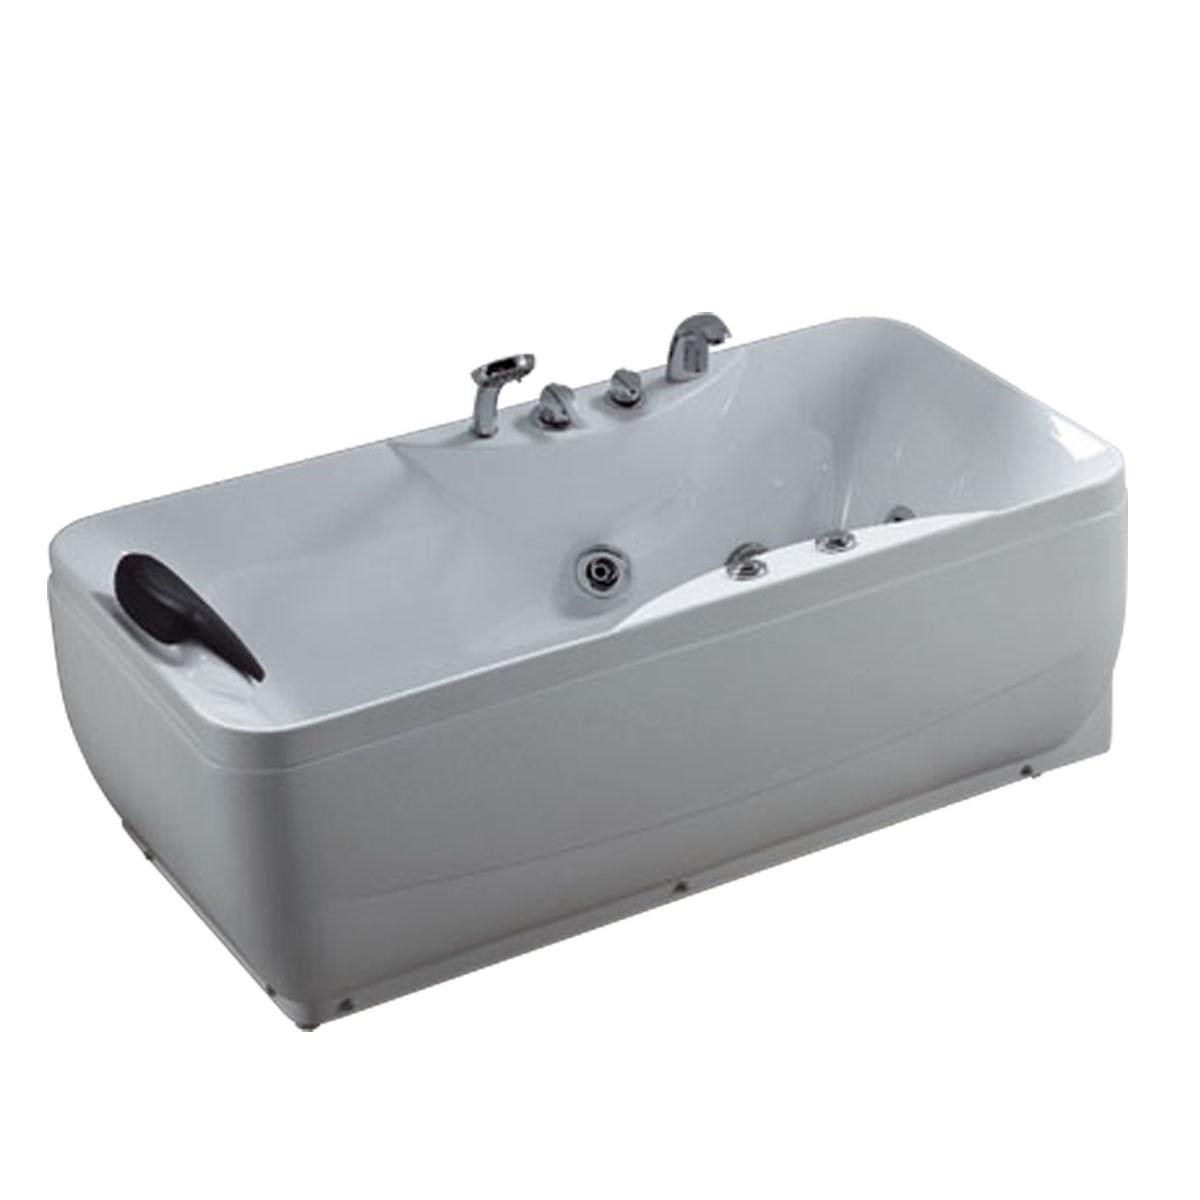 WOMA正品浴缸 独立浴缸 进口亚克力按摩浴缸 WX348